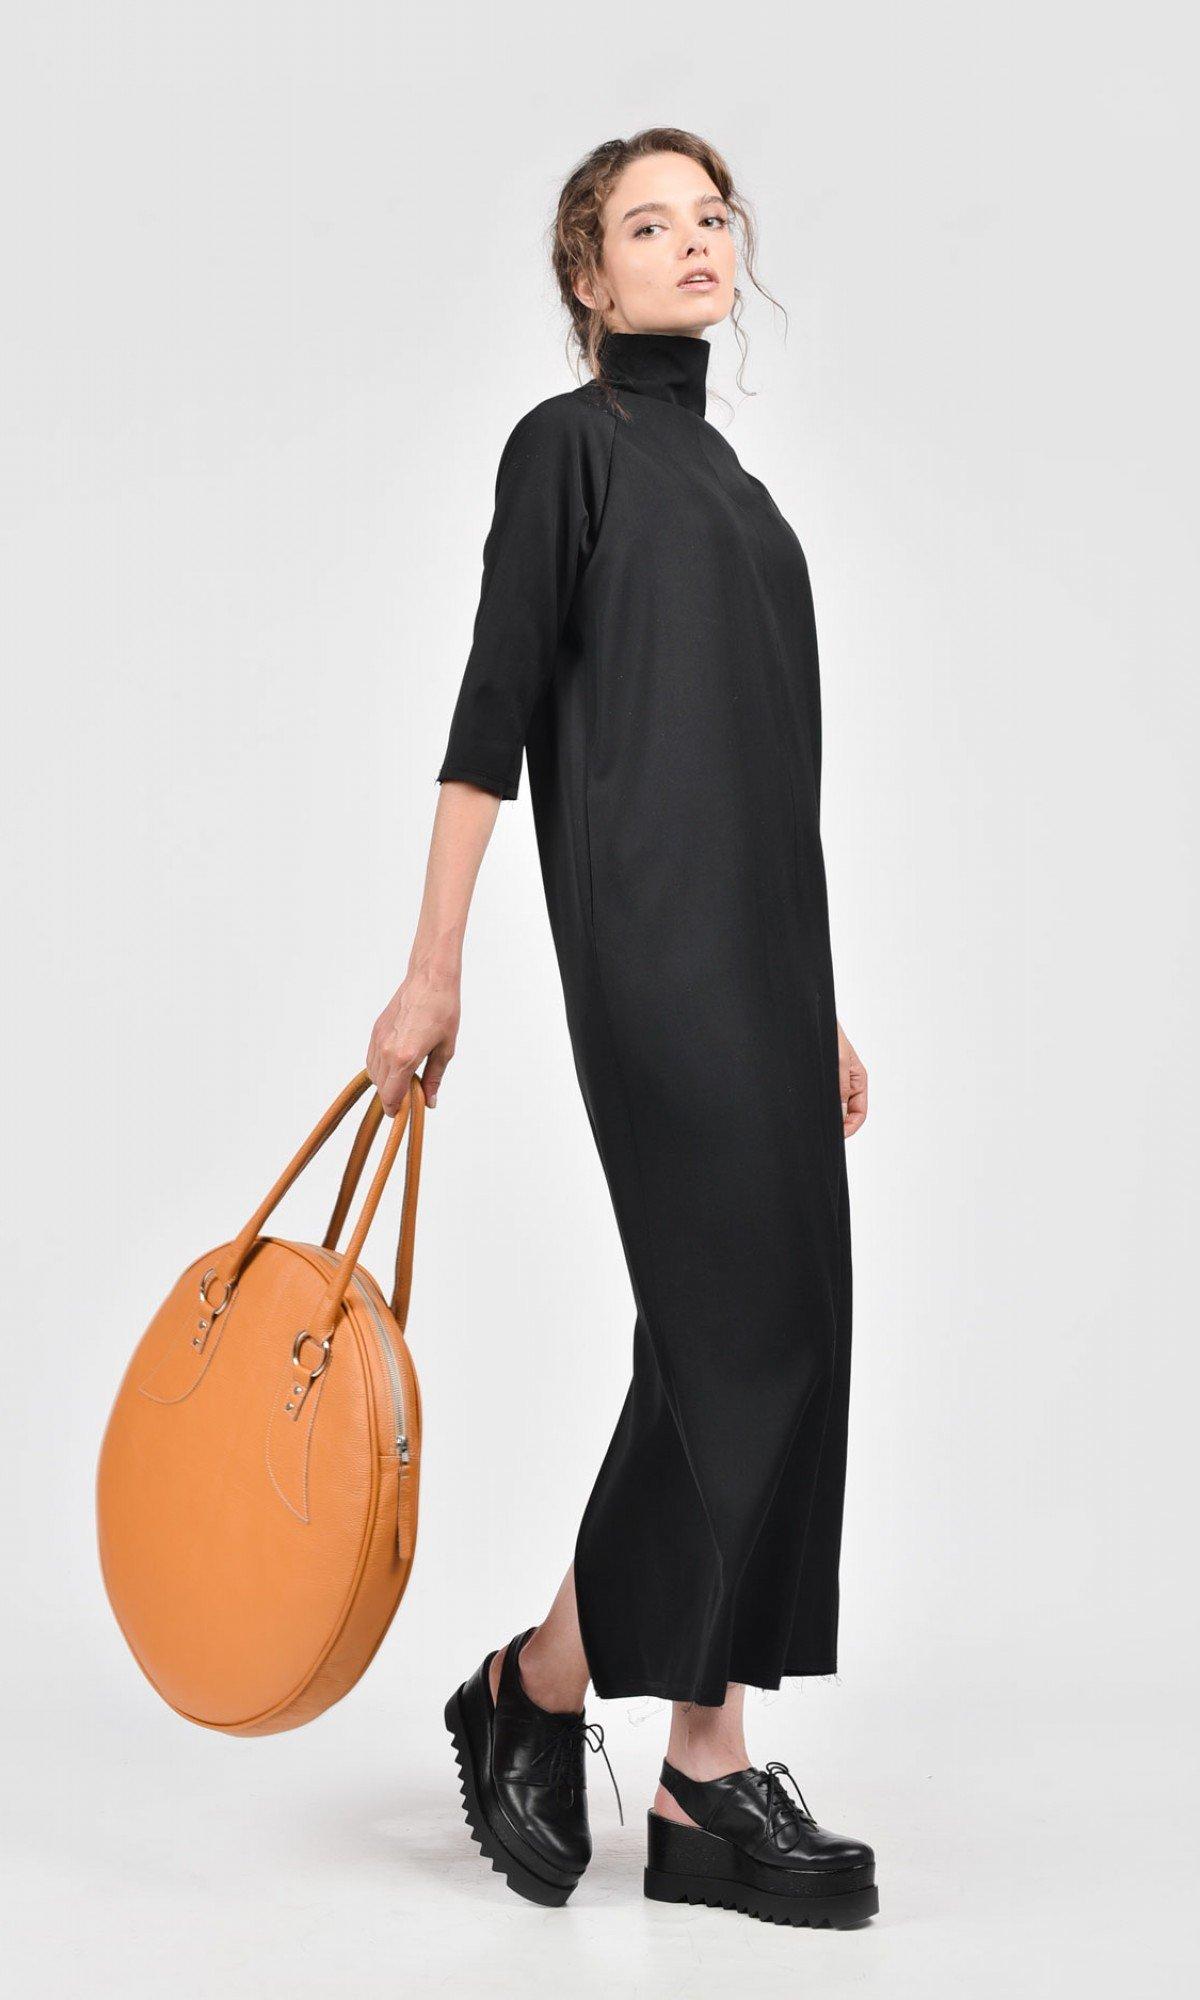 Black Cold Wool Dress A03179